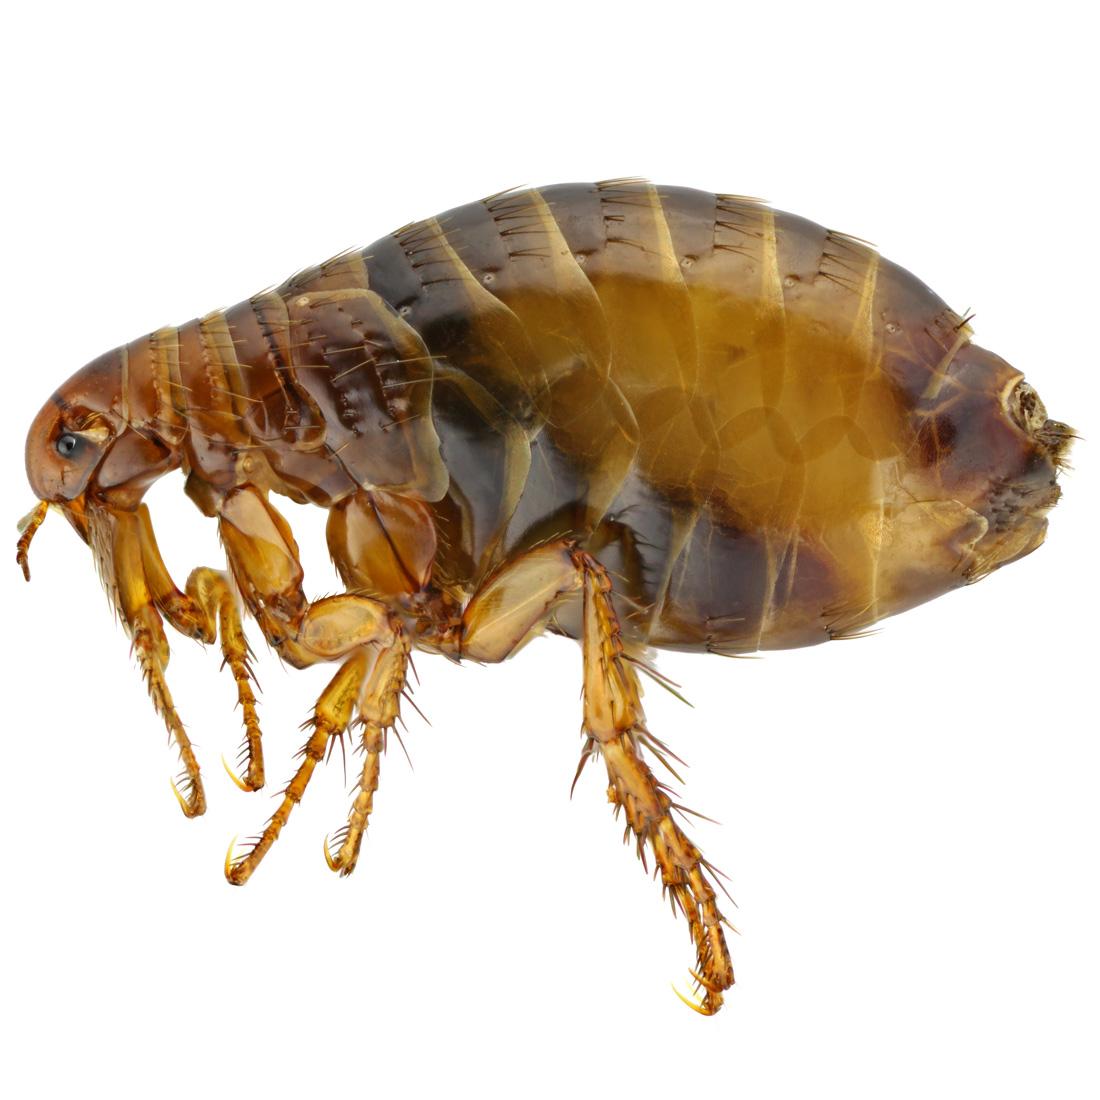 flea-bites-1100.jpg